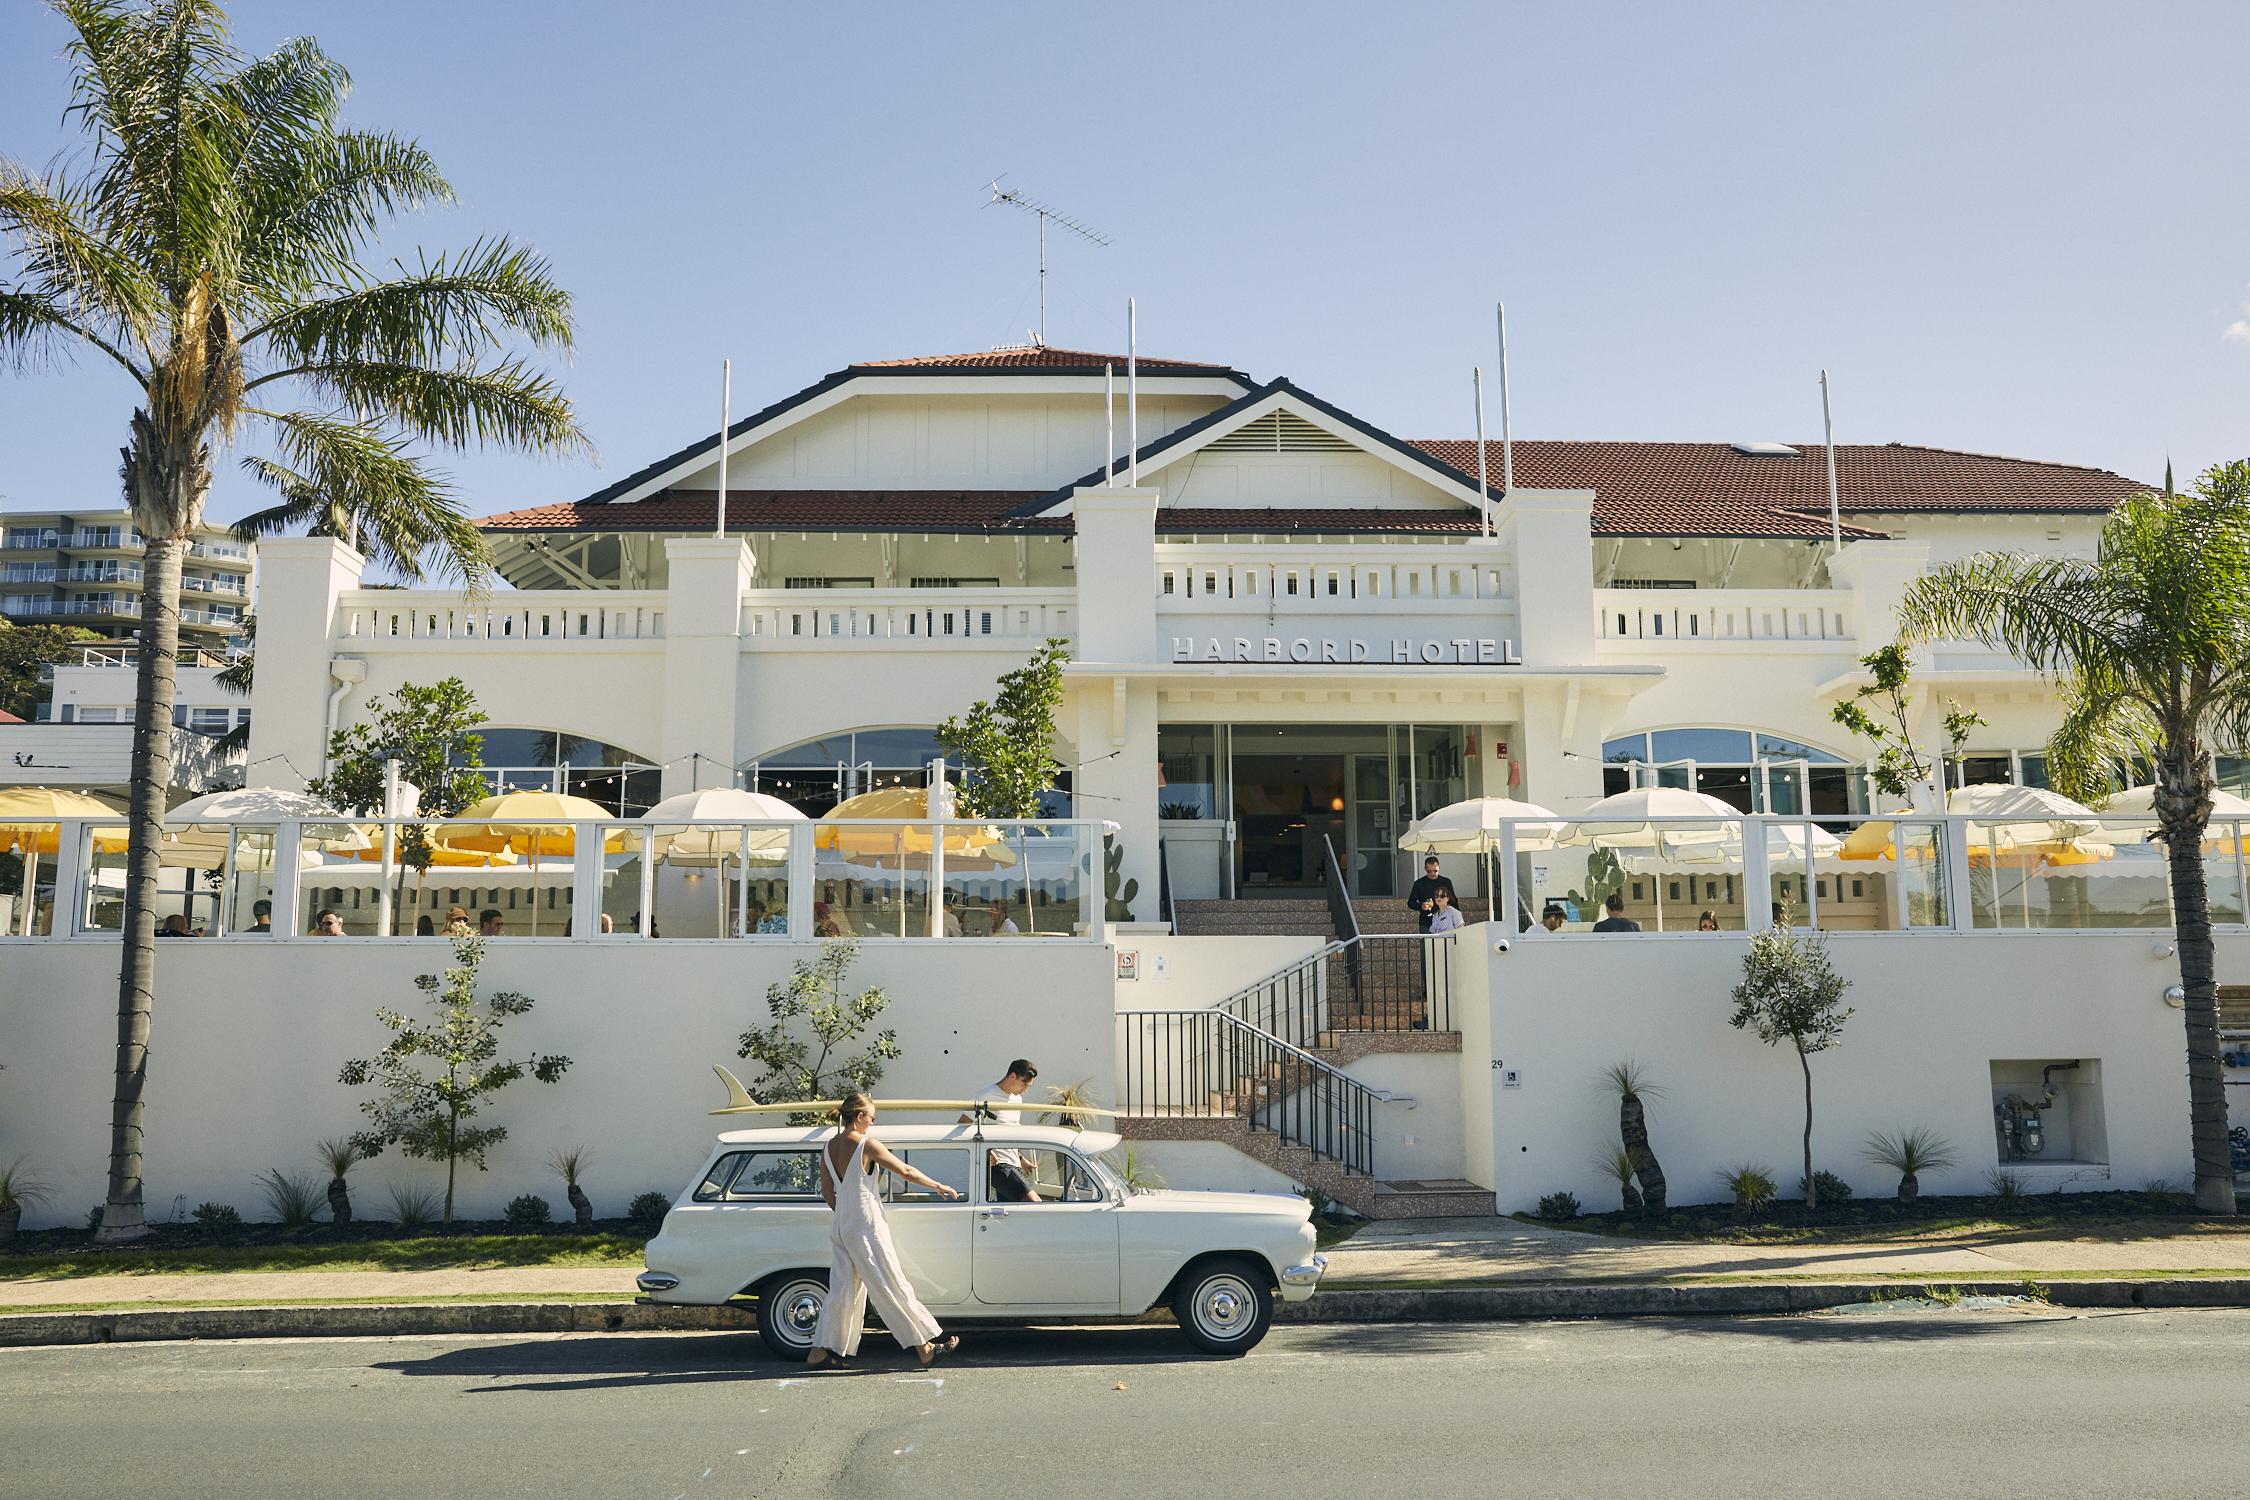 Harbord Hotel Drive Through Freshwater